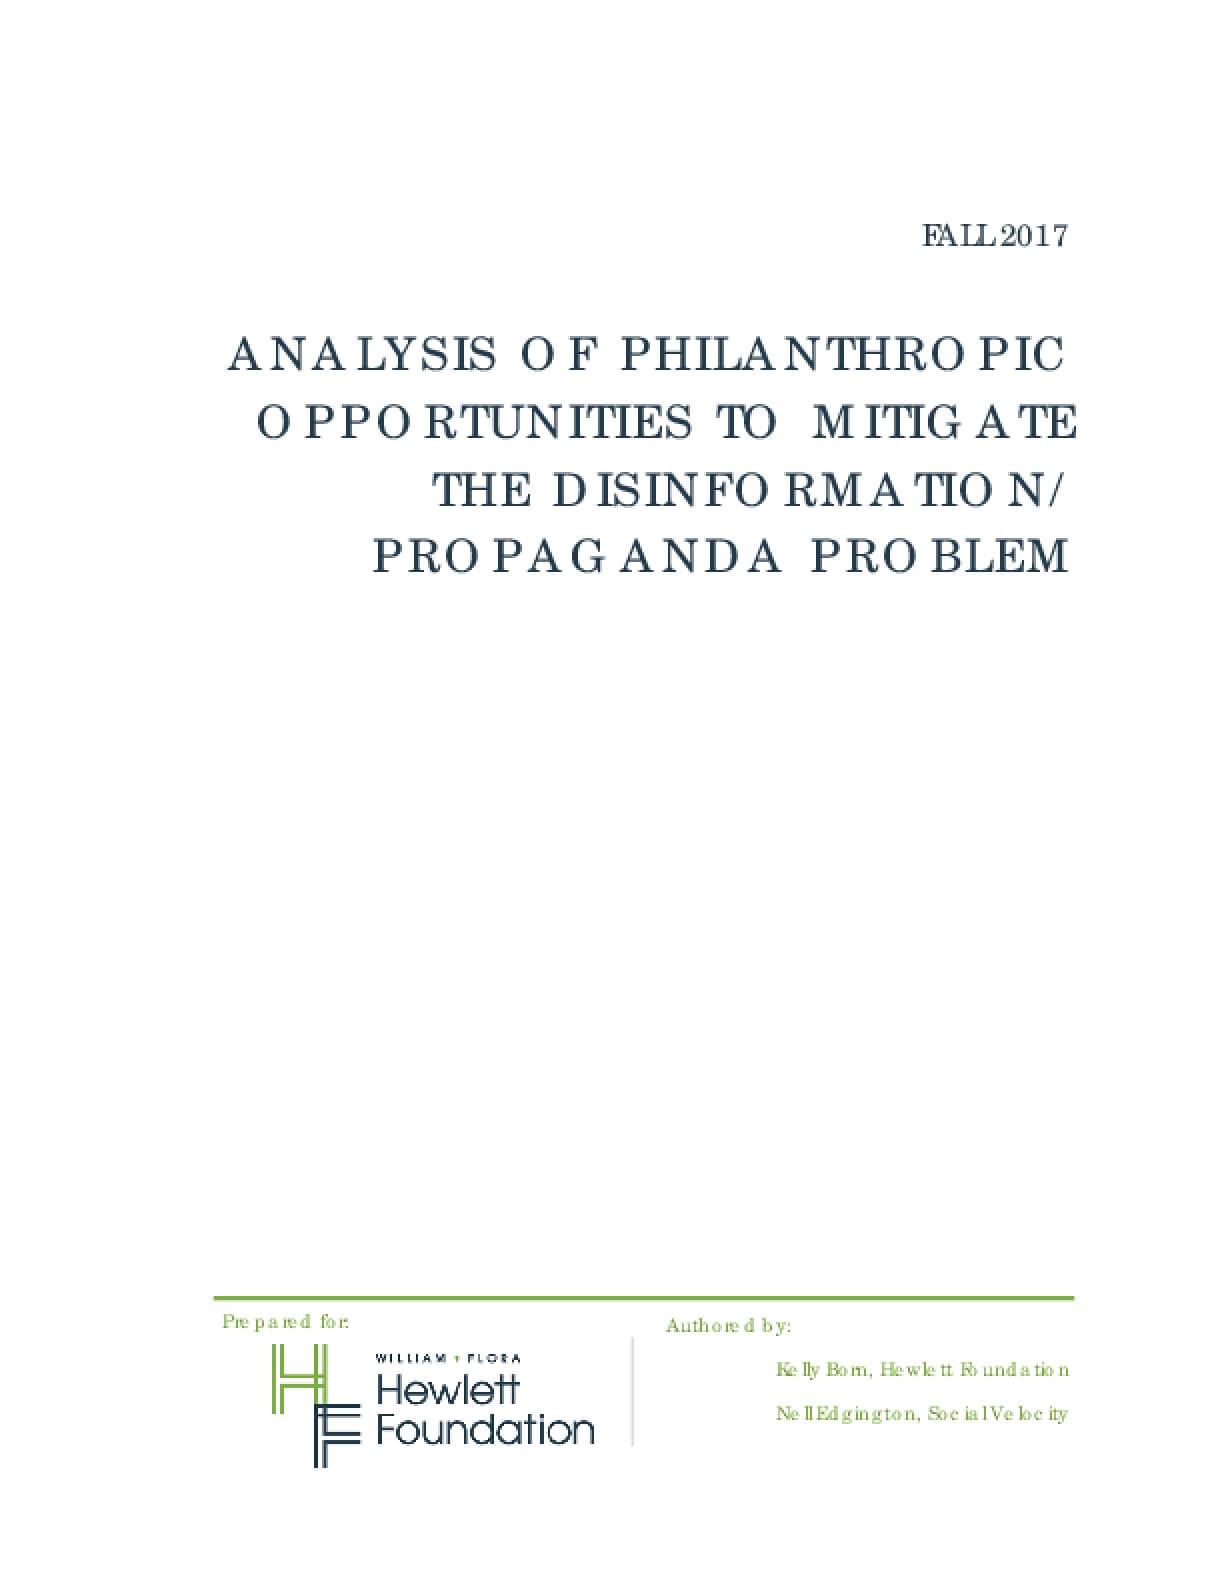 Analysis of Philanthropic Opportunities to Mitigate the Disinformation/Propaganda Problem